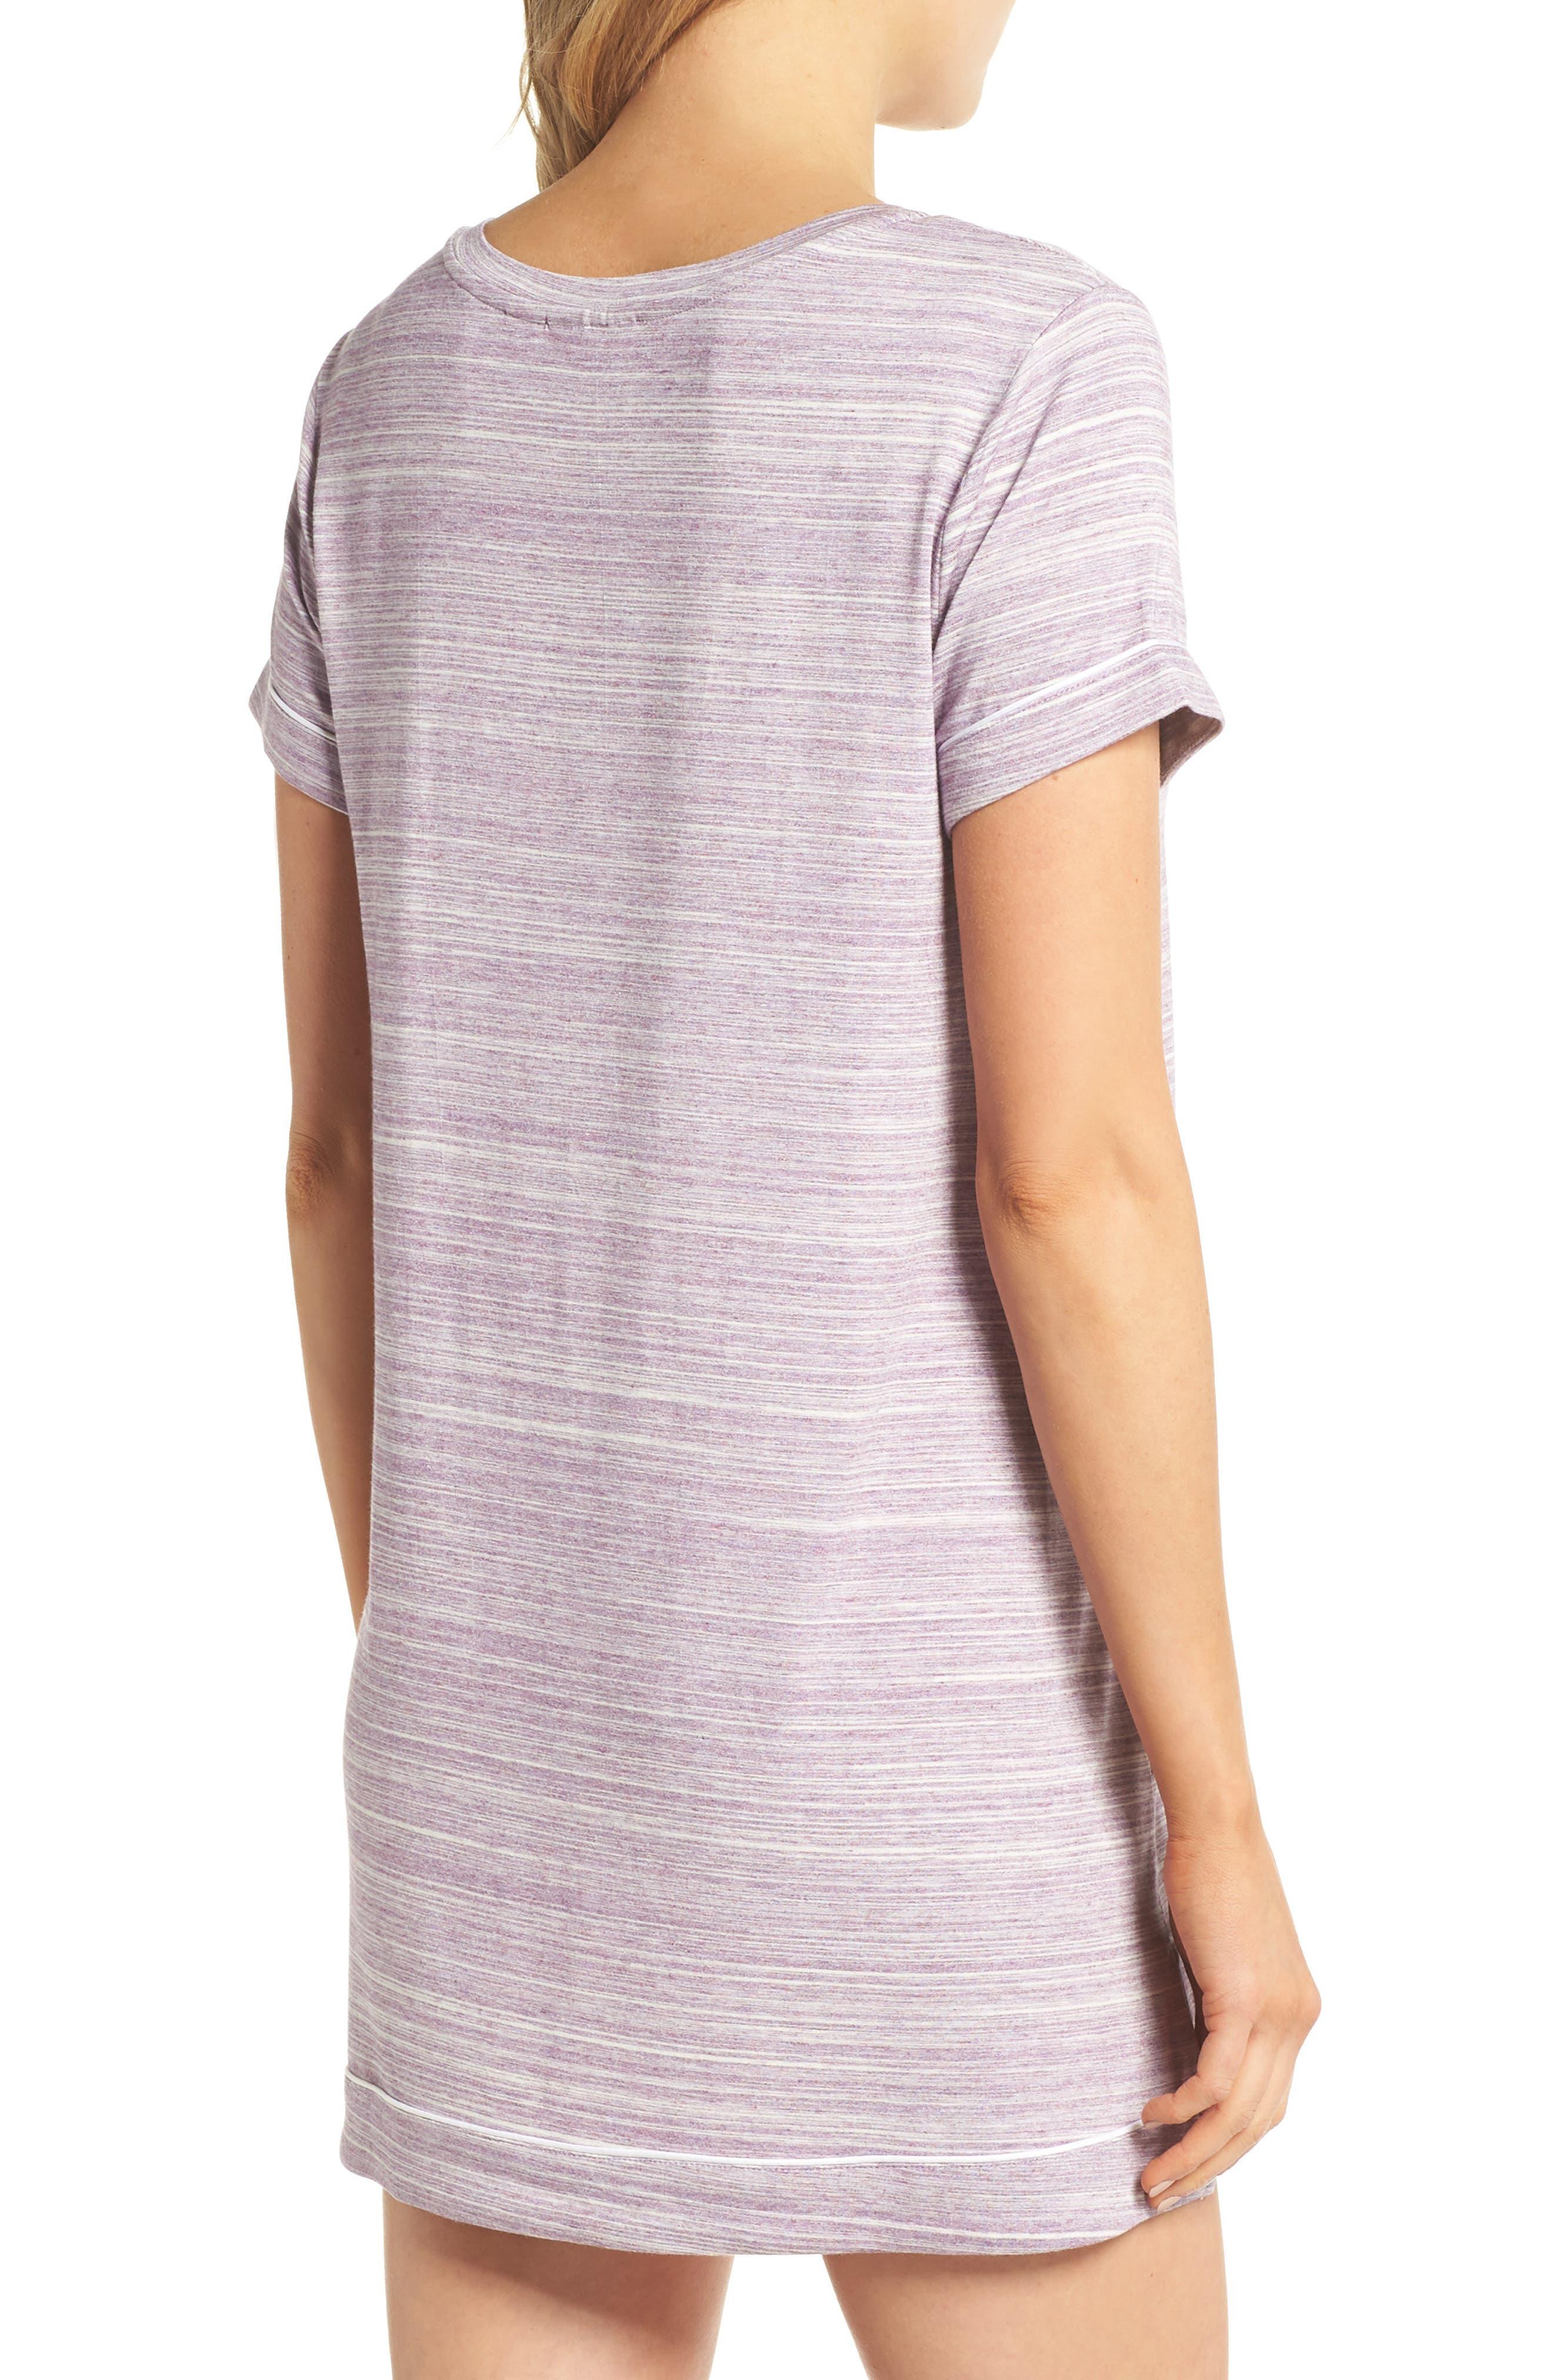 Moonlight Sleep Shirt,                             Alternate thumbnail 2, color,                             Purple Spacedye